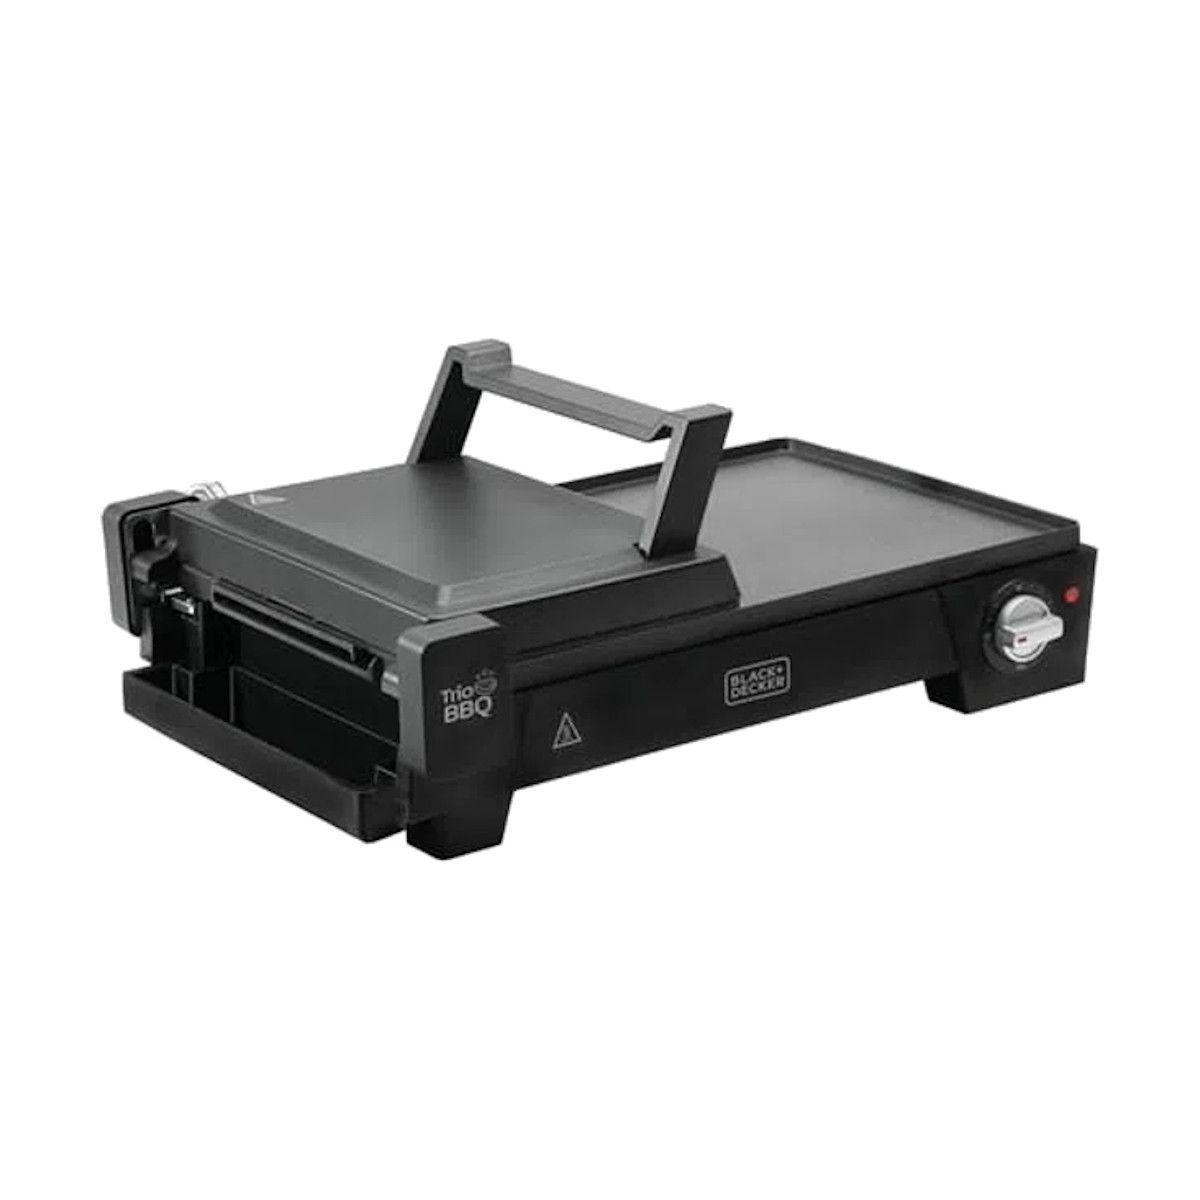 Grill Elétrico 3 em 1 Sanduicheira e Churrasqueira Black Decker g2200